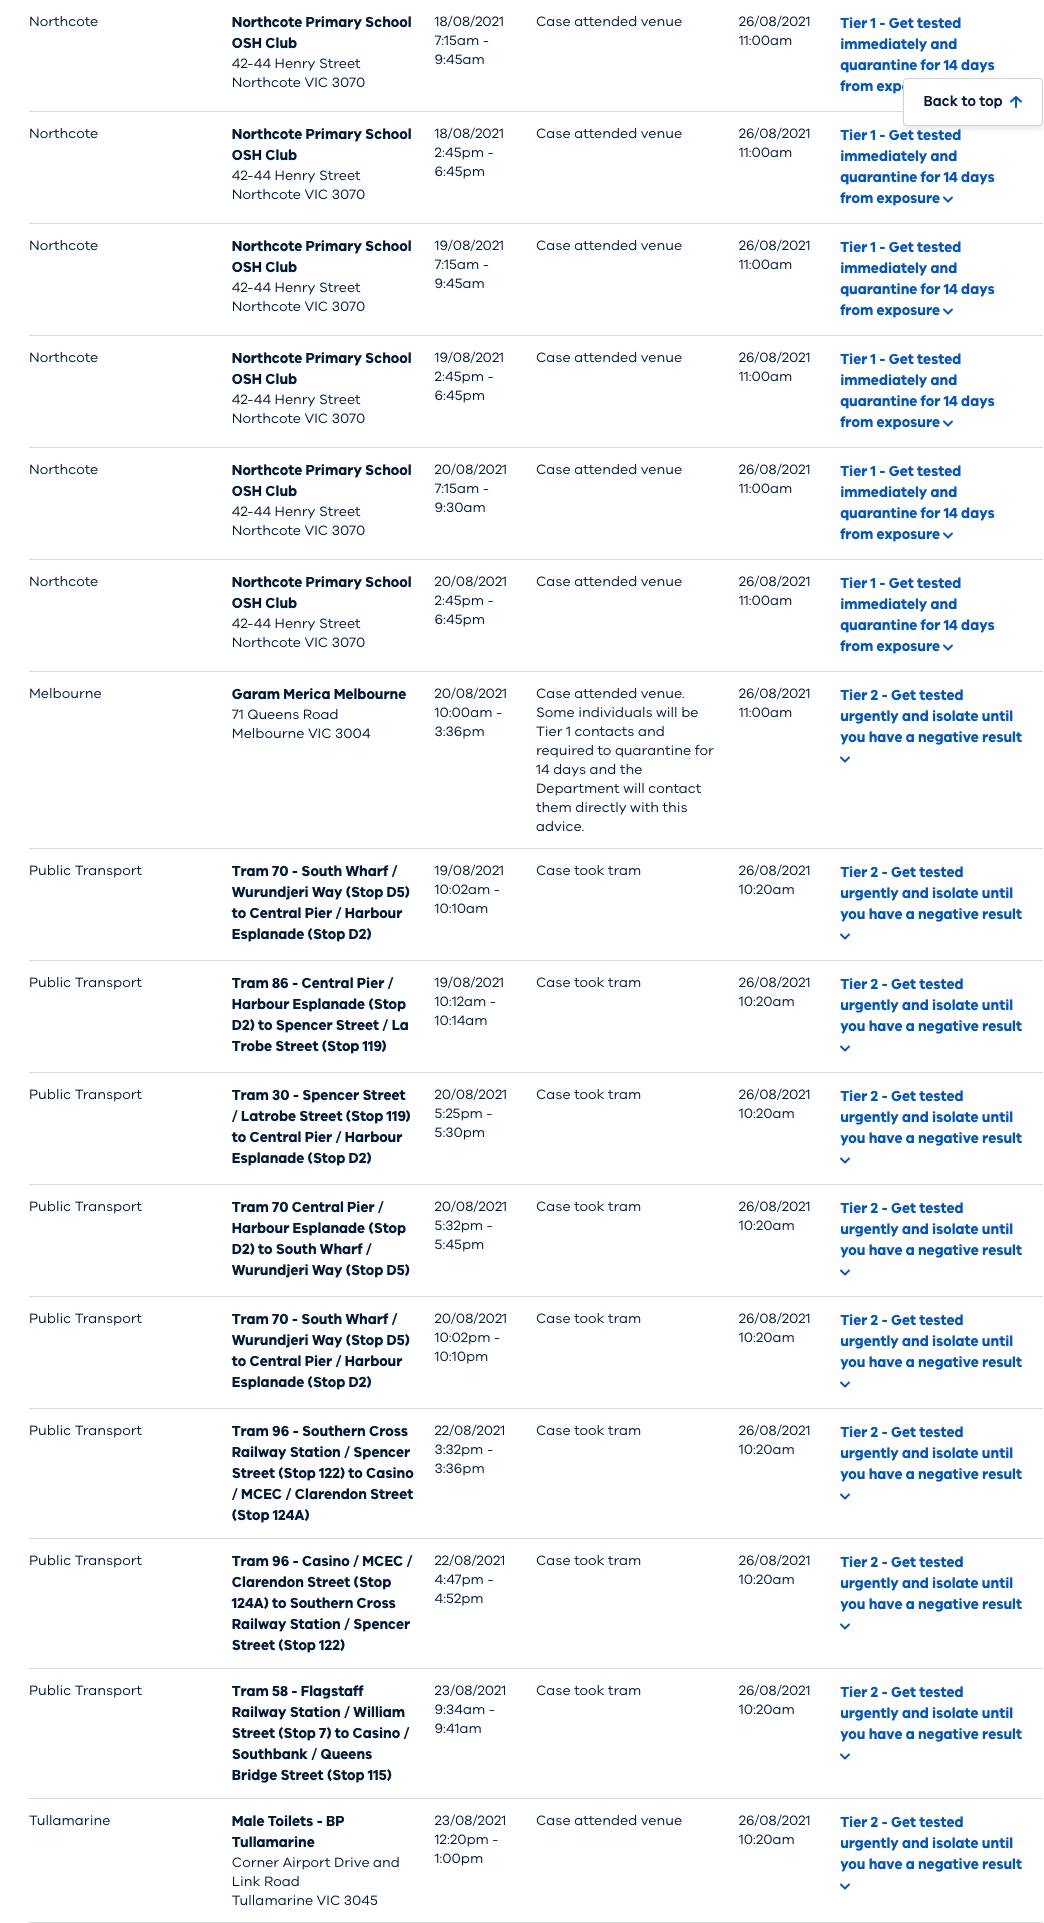 www.coronavirus.vic.gov.au_exposure-sites (11).png